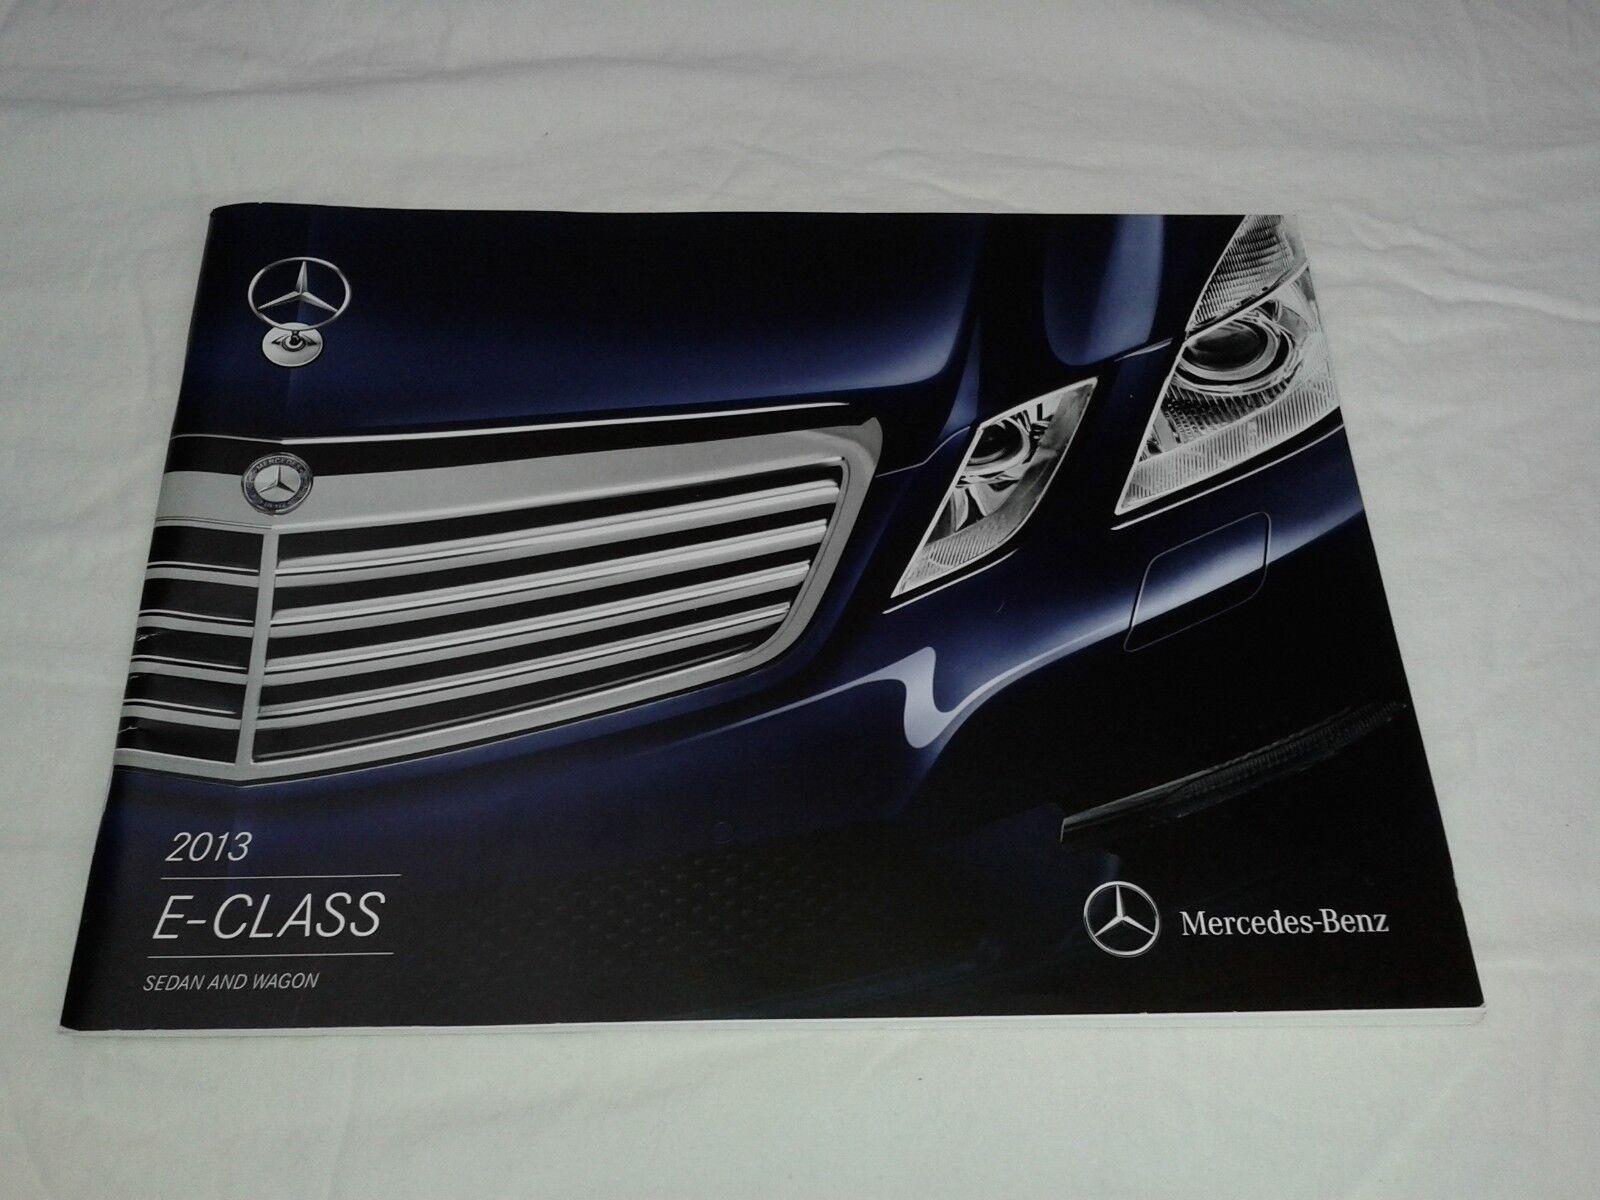 2013 Mercedes Benz E-Class Sedan & Wagon Sales Brochure Catalog